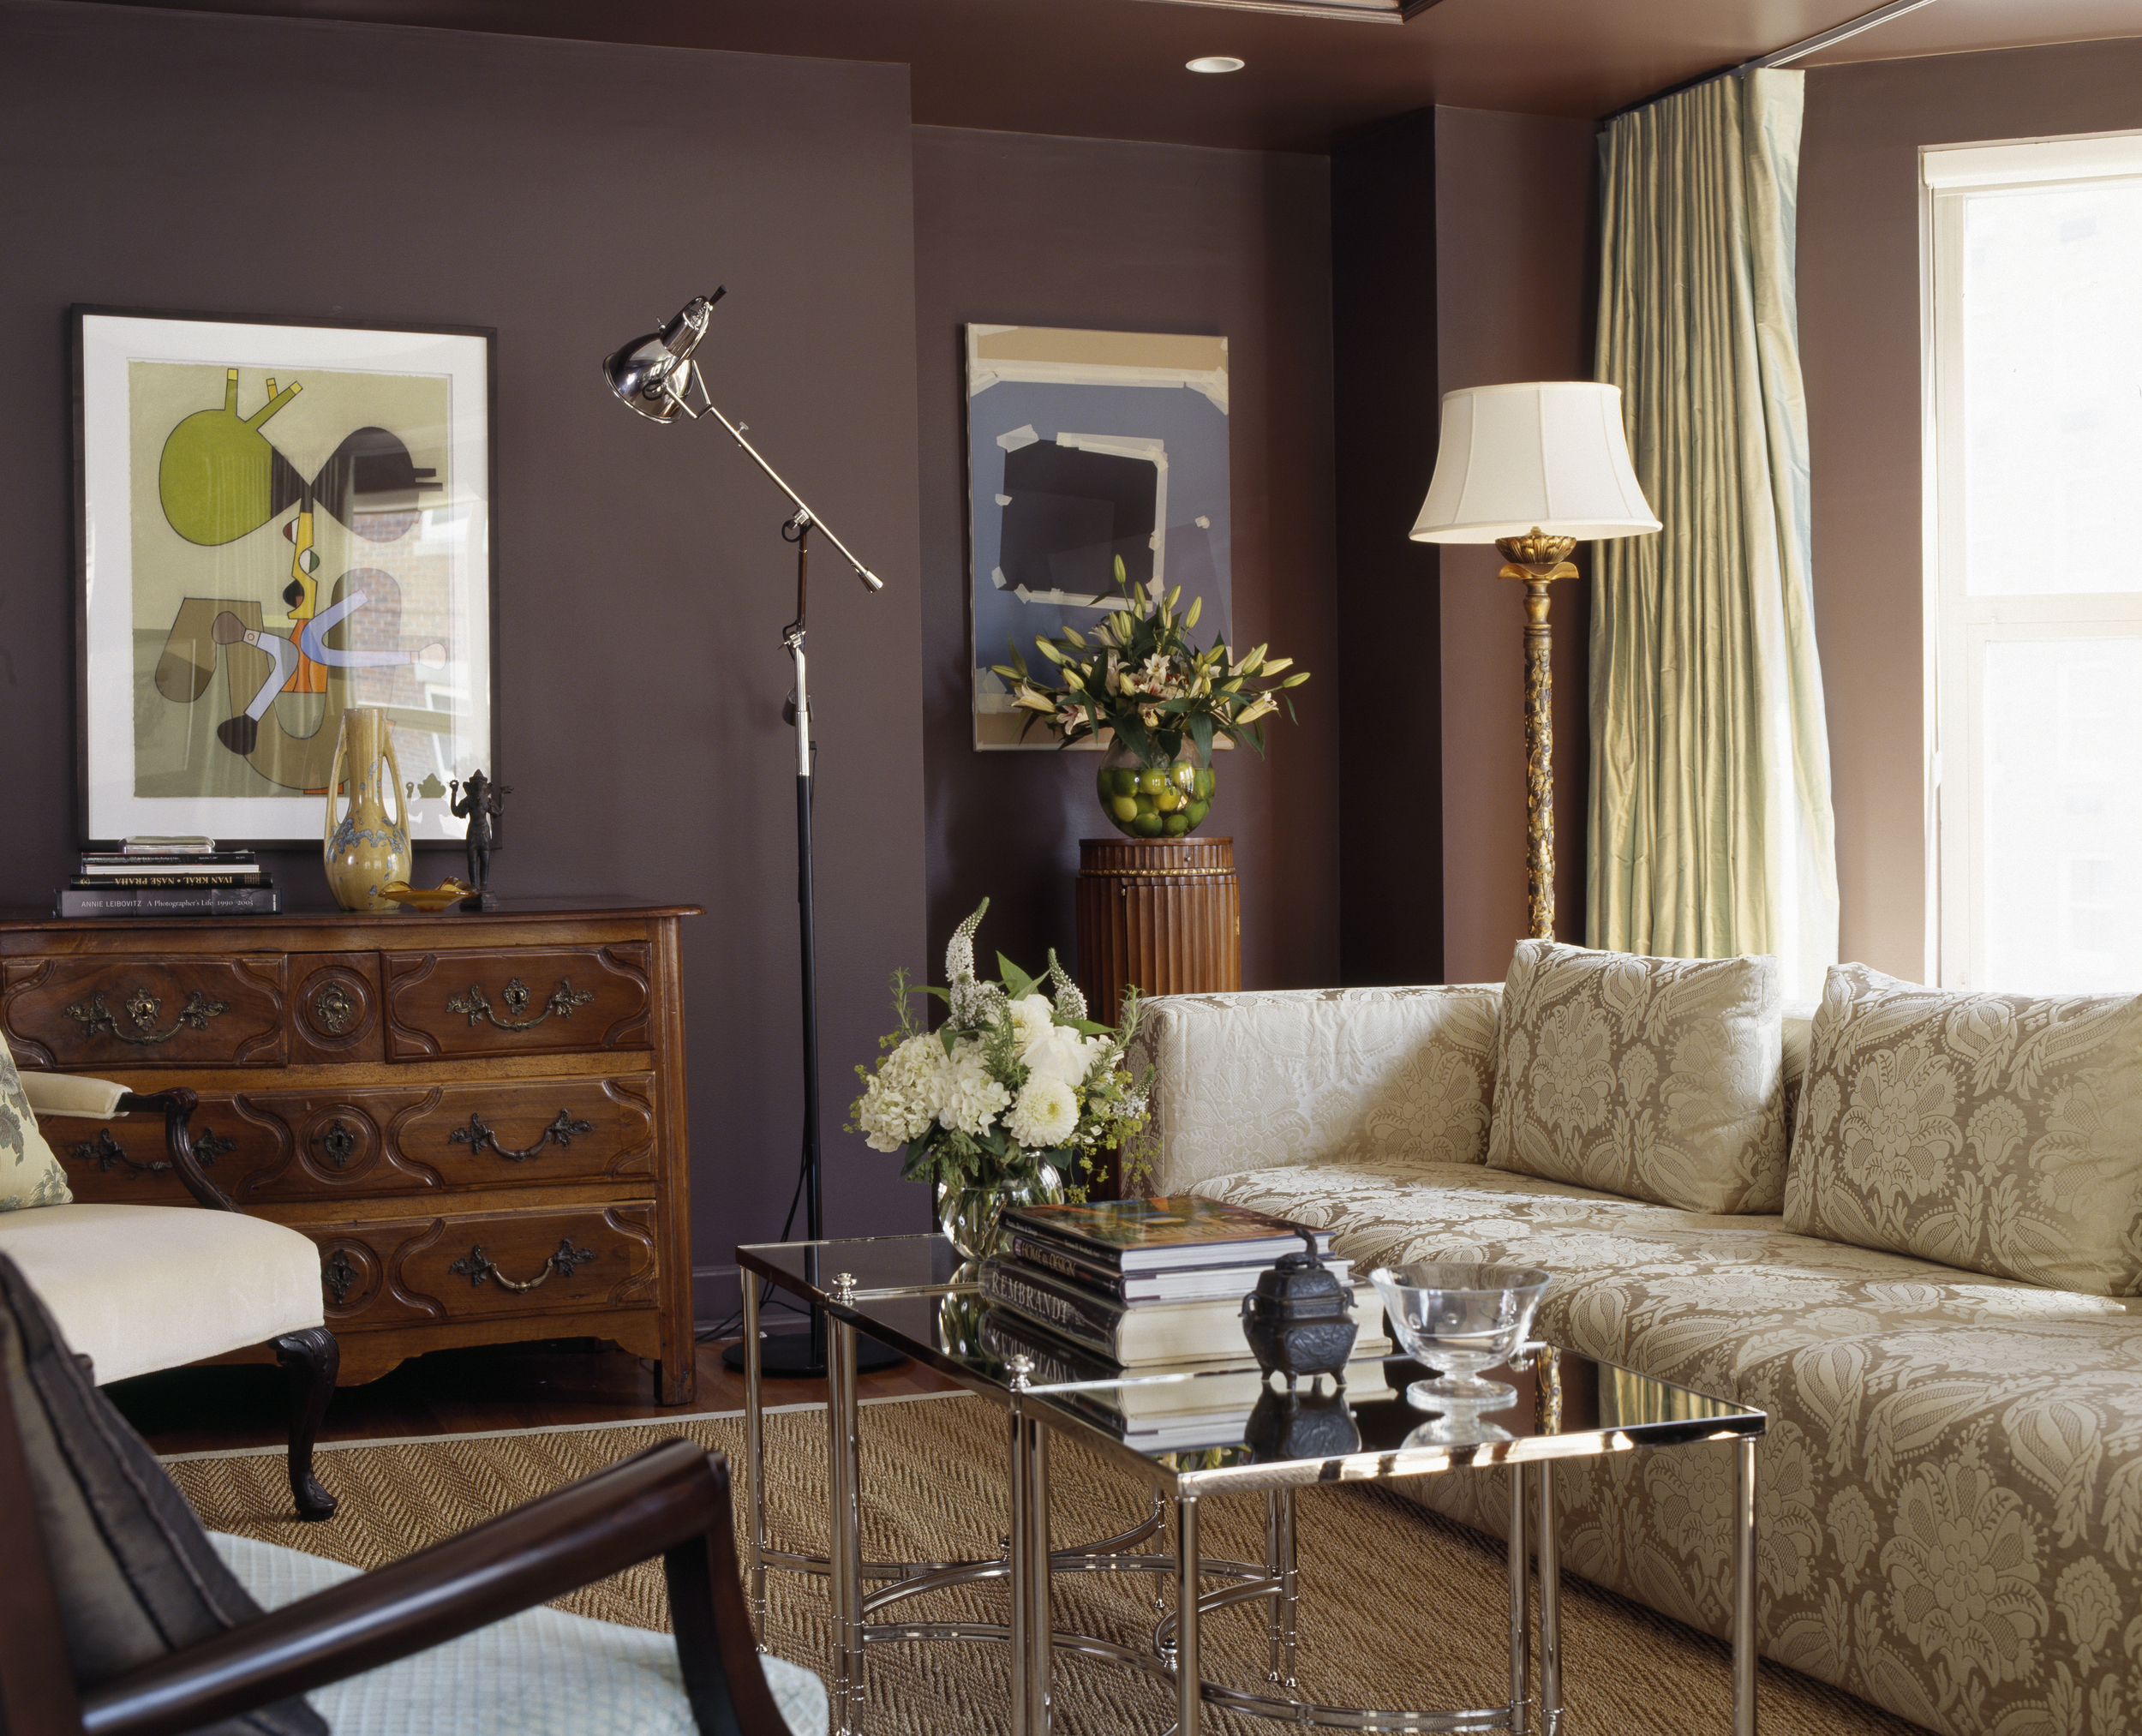 Gentlemanly Quarters - New England Home Magazine